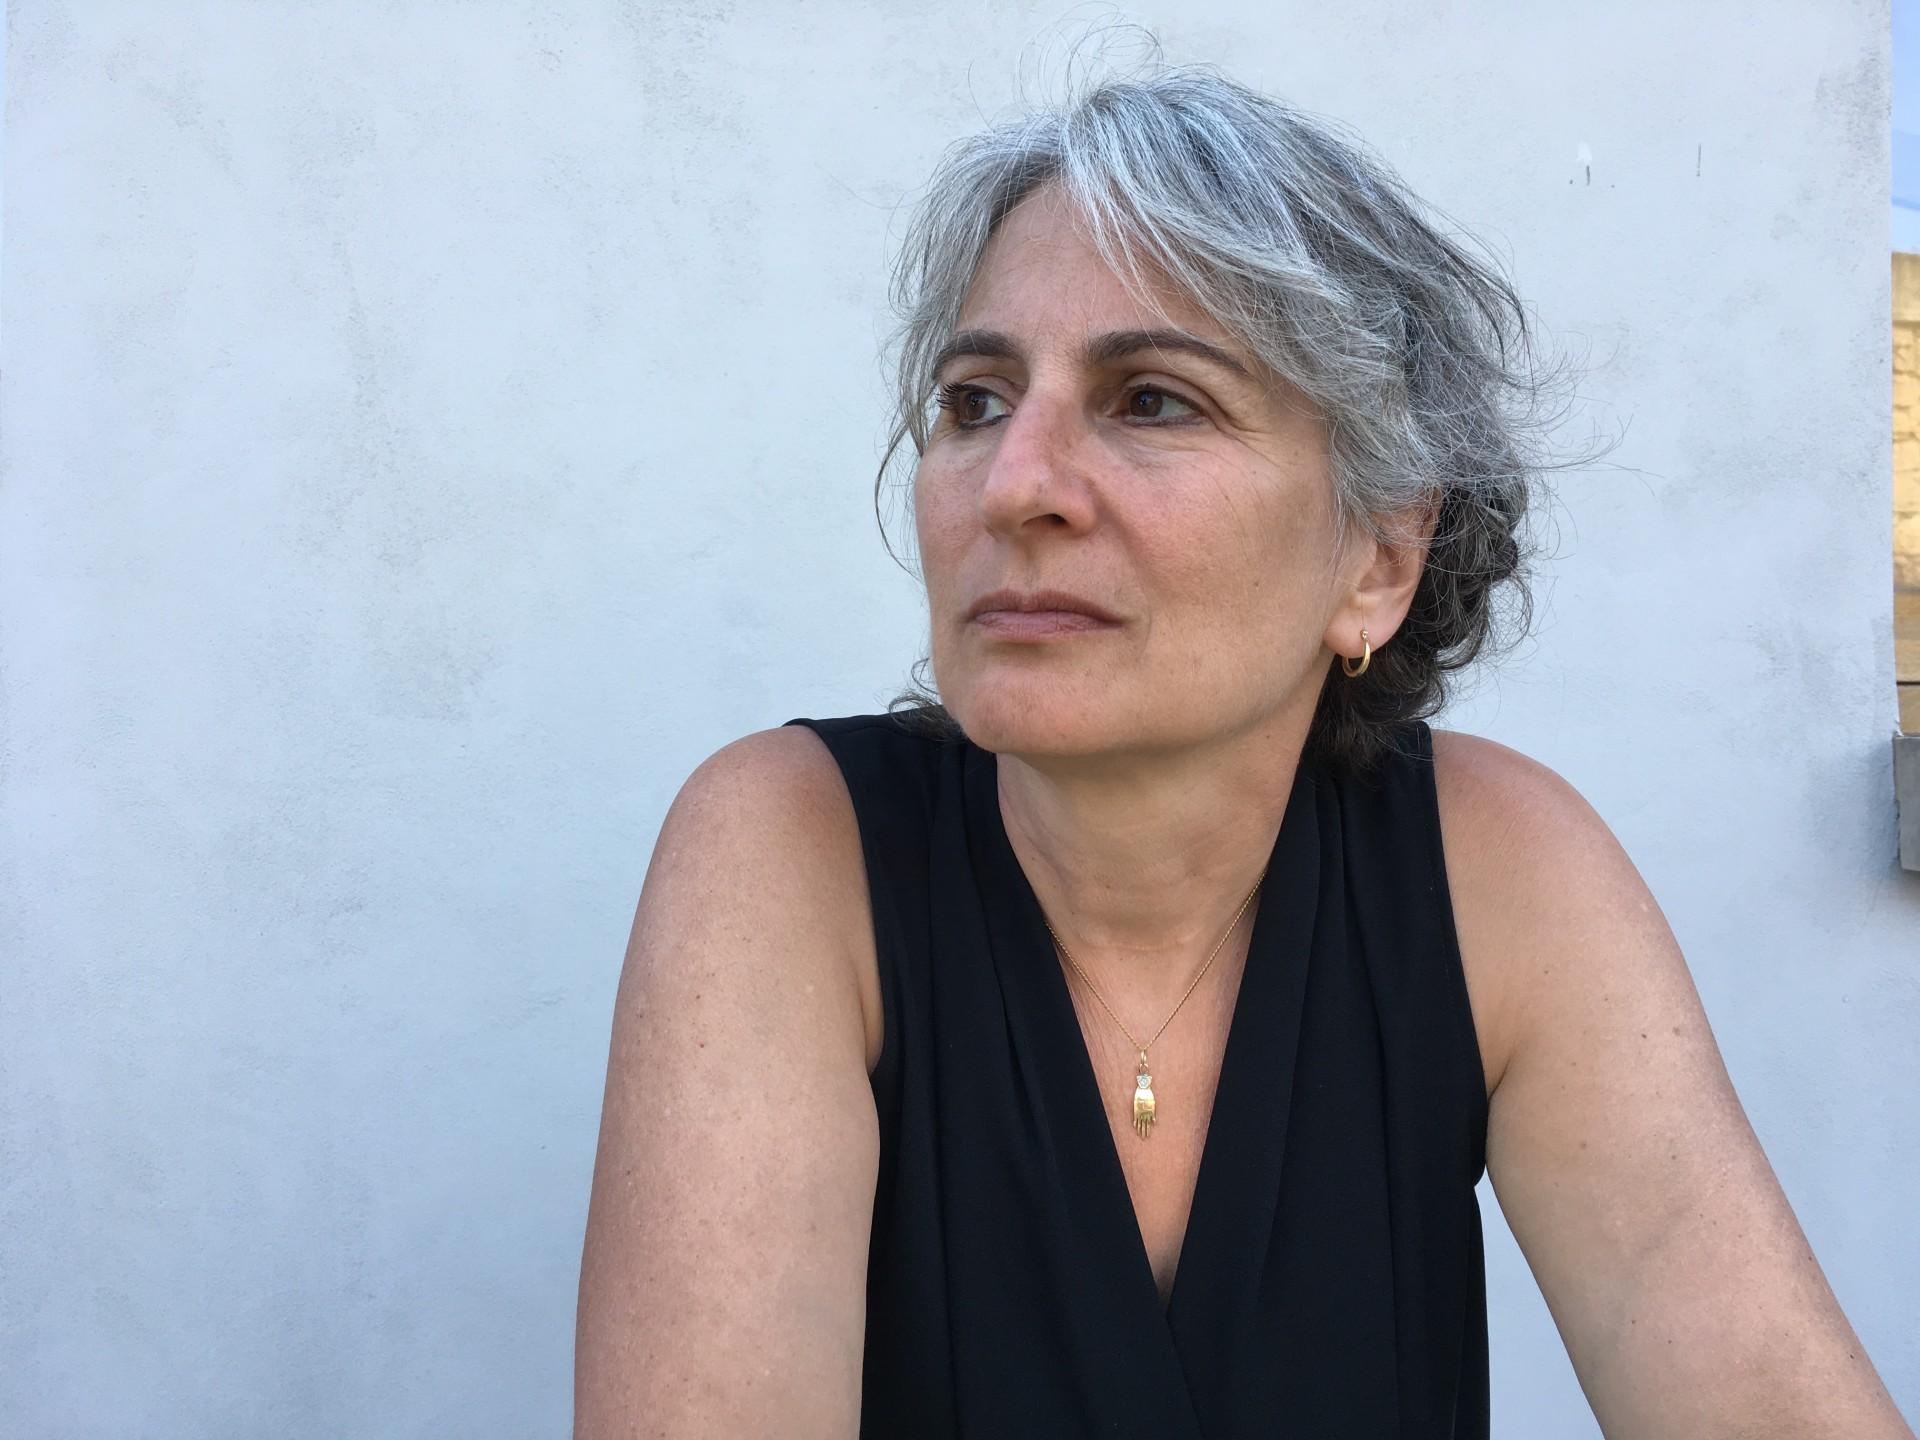 Margie Patlak